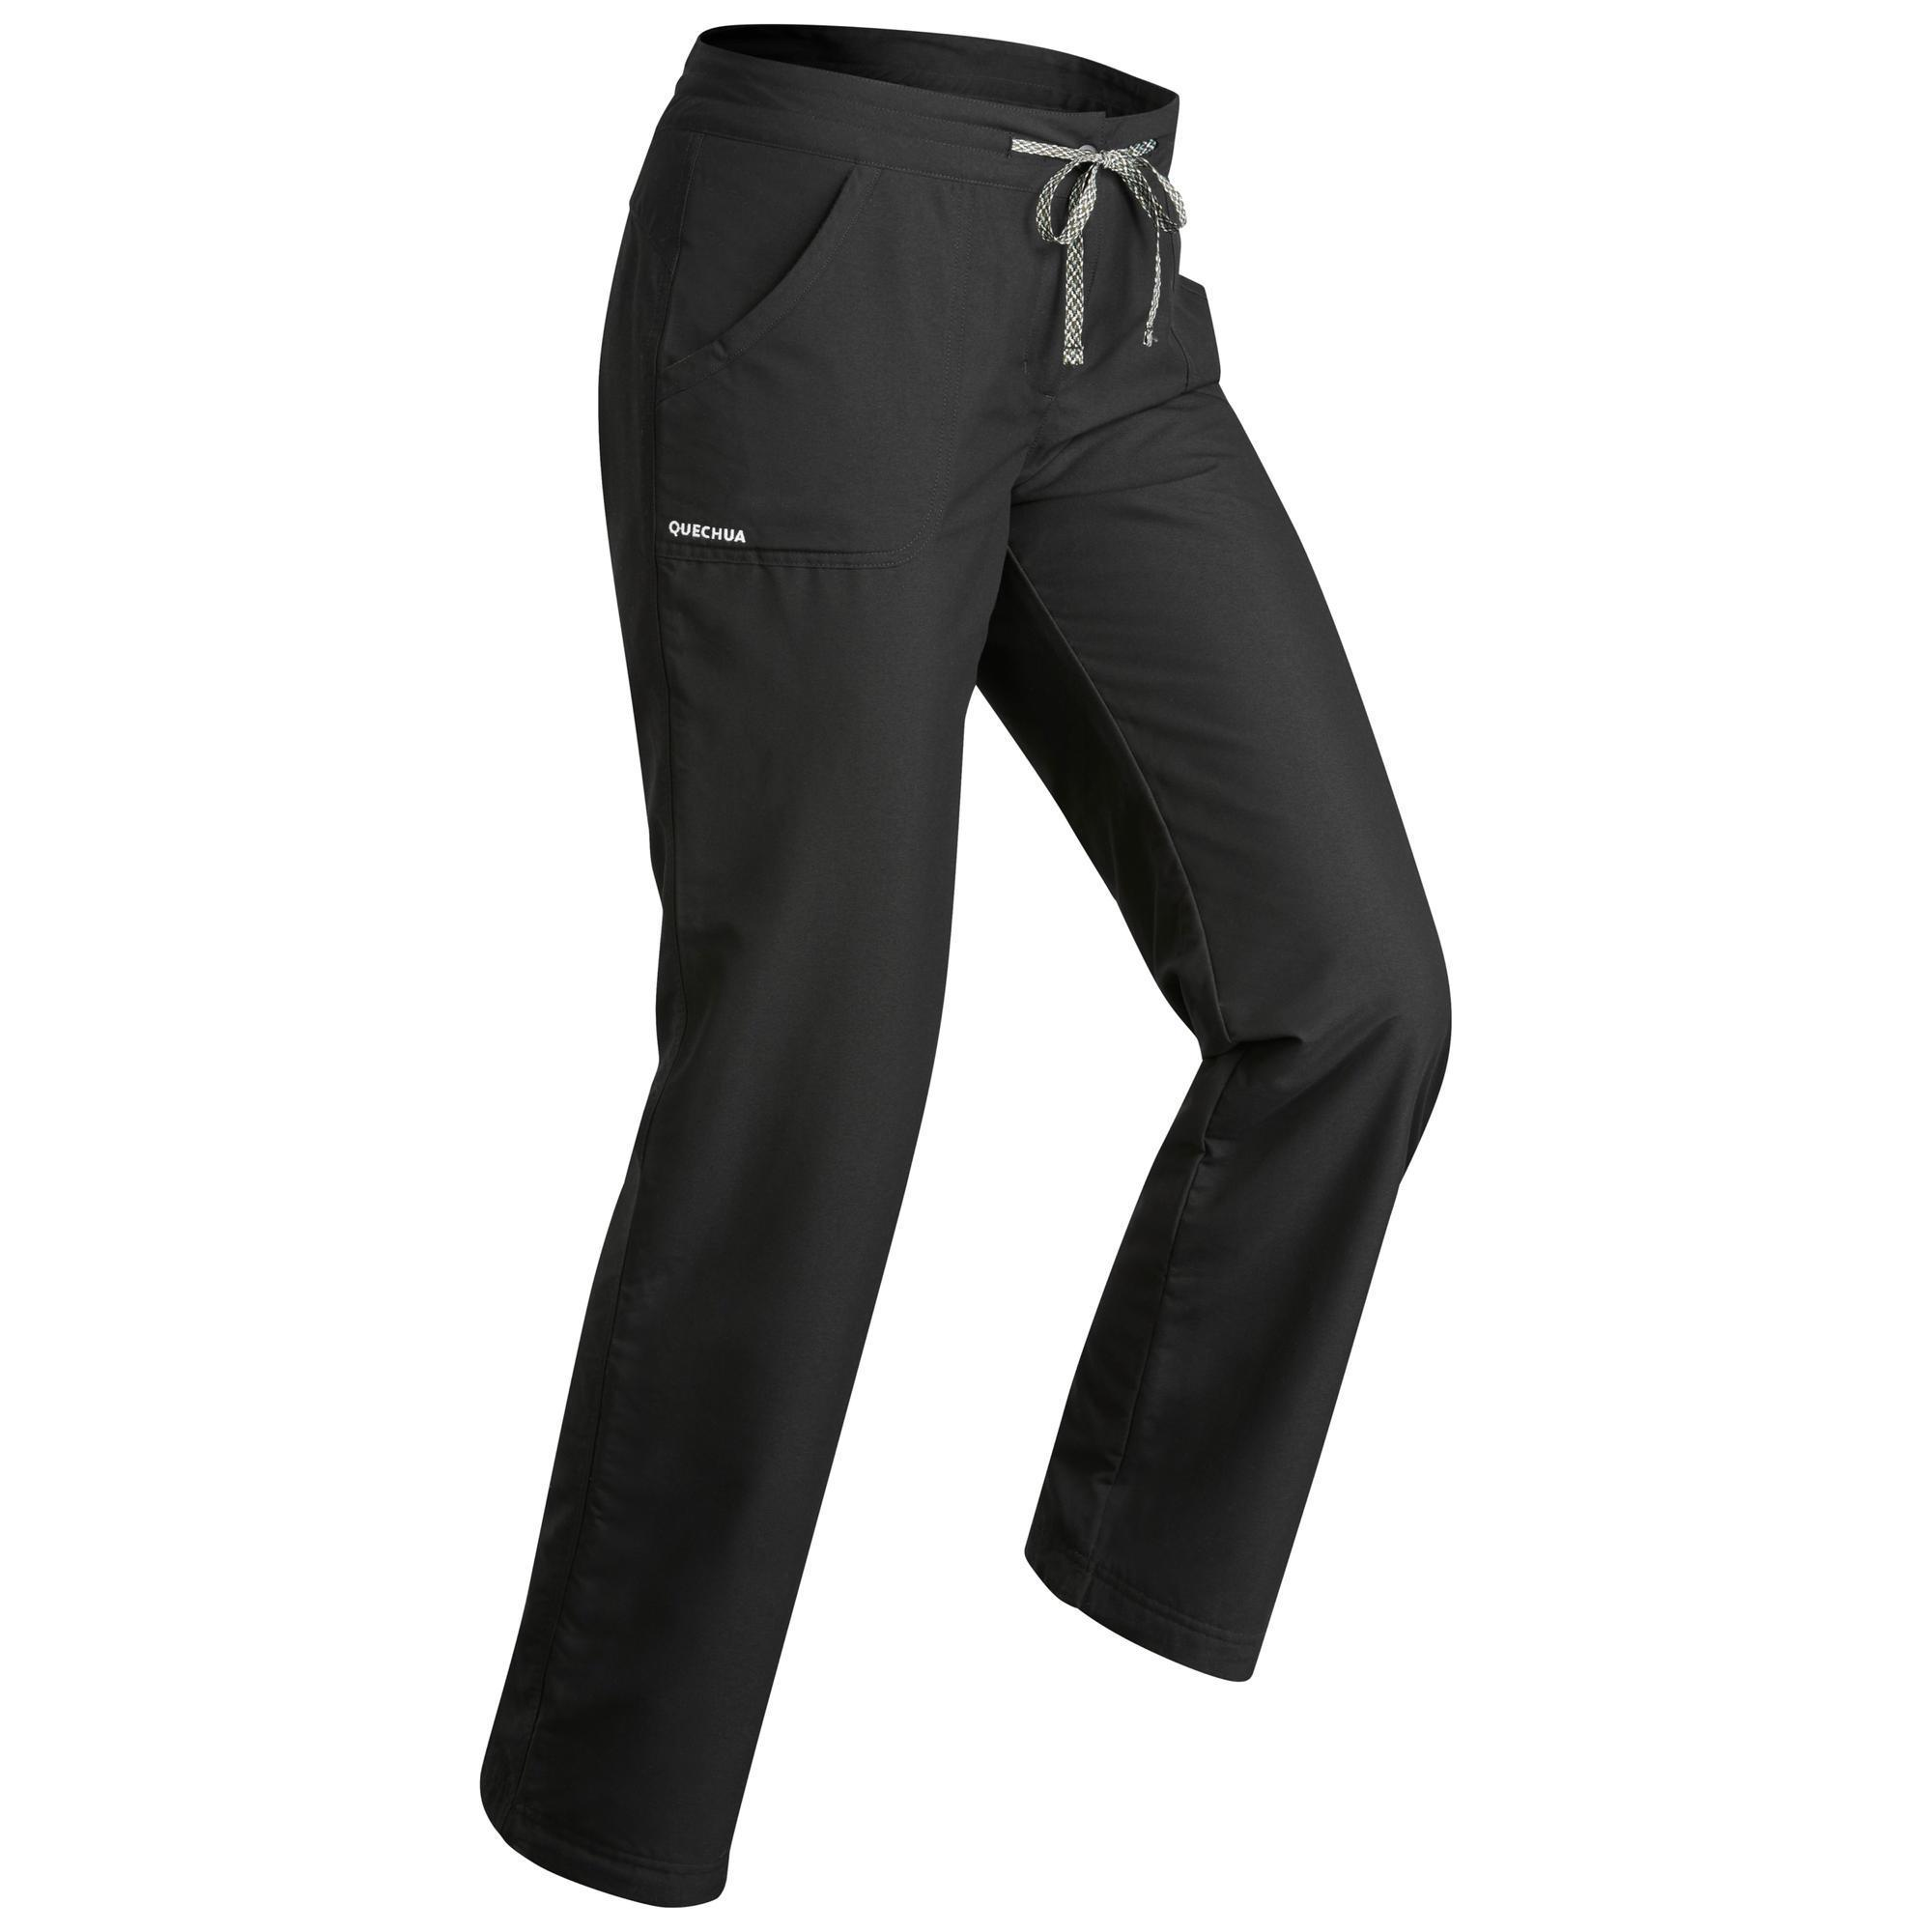 Wanderhose Winterwandern SH100 Ultra-Warm Damen schwarz | Bekleidung > Hosen > Outdoorhosen | Schwarz | Quechua